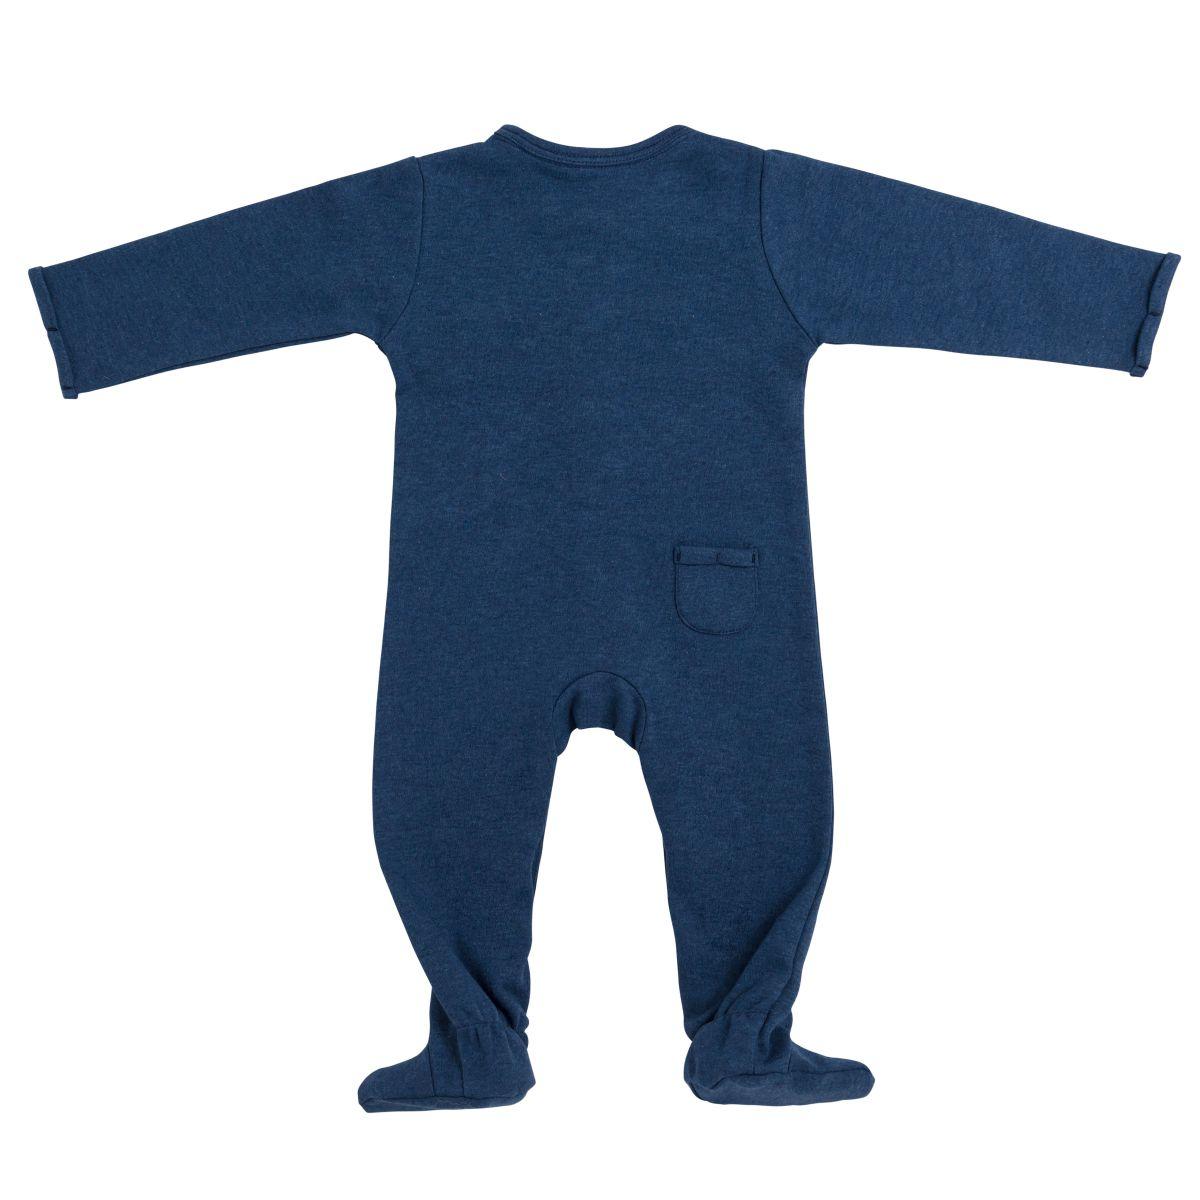 babys only 3545028 boxpakje met voetjes melange 50 jeans 2